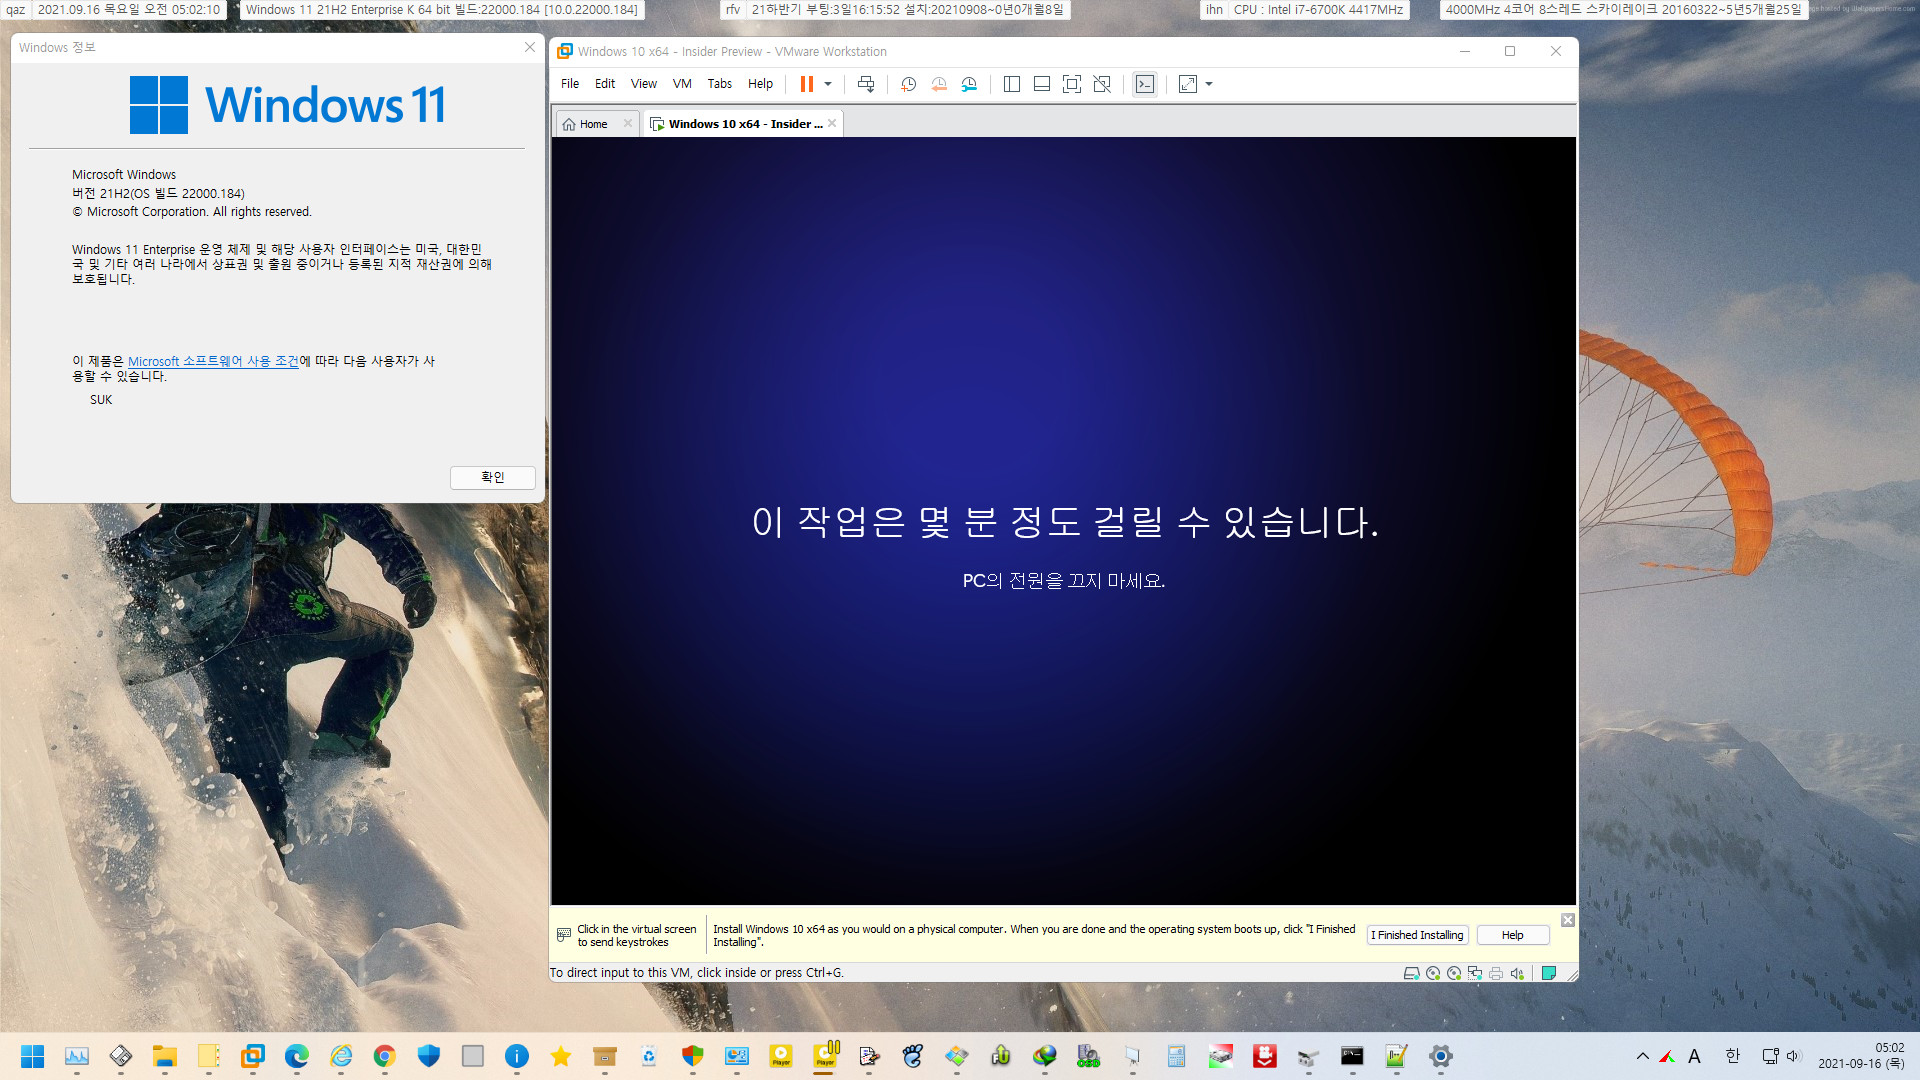 Windows 11 인사이더 프리뷰 - 버전 Dev (OS 빌드 22458.1000) 나왔네요 - 개발자 채널 - uup 사이트 2군데 전부 한국어 iso가 install.wim 단계에서 오류가 생겨서 윈도우 업데이트에서 uup 파일들 다운로드하여 iso 만드는데 성공했습니다 2021-09-16_050210.jpg